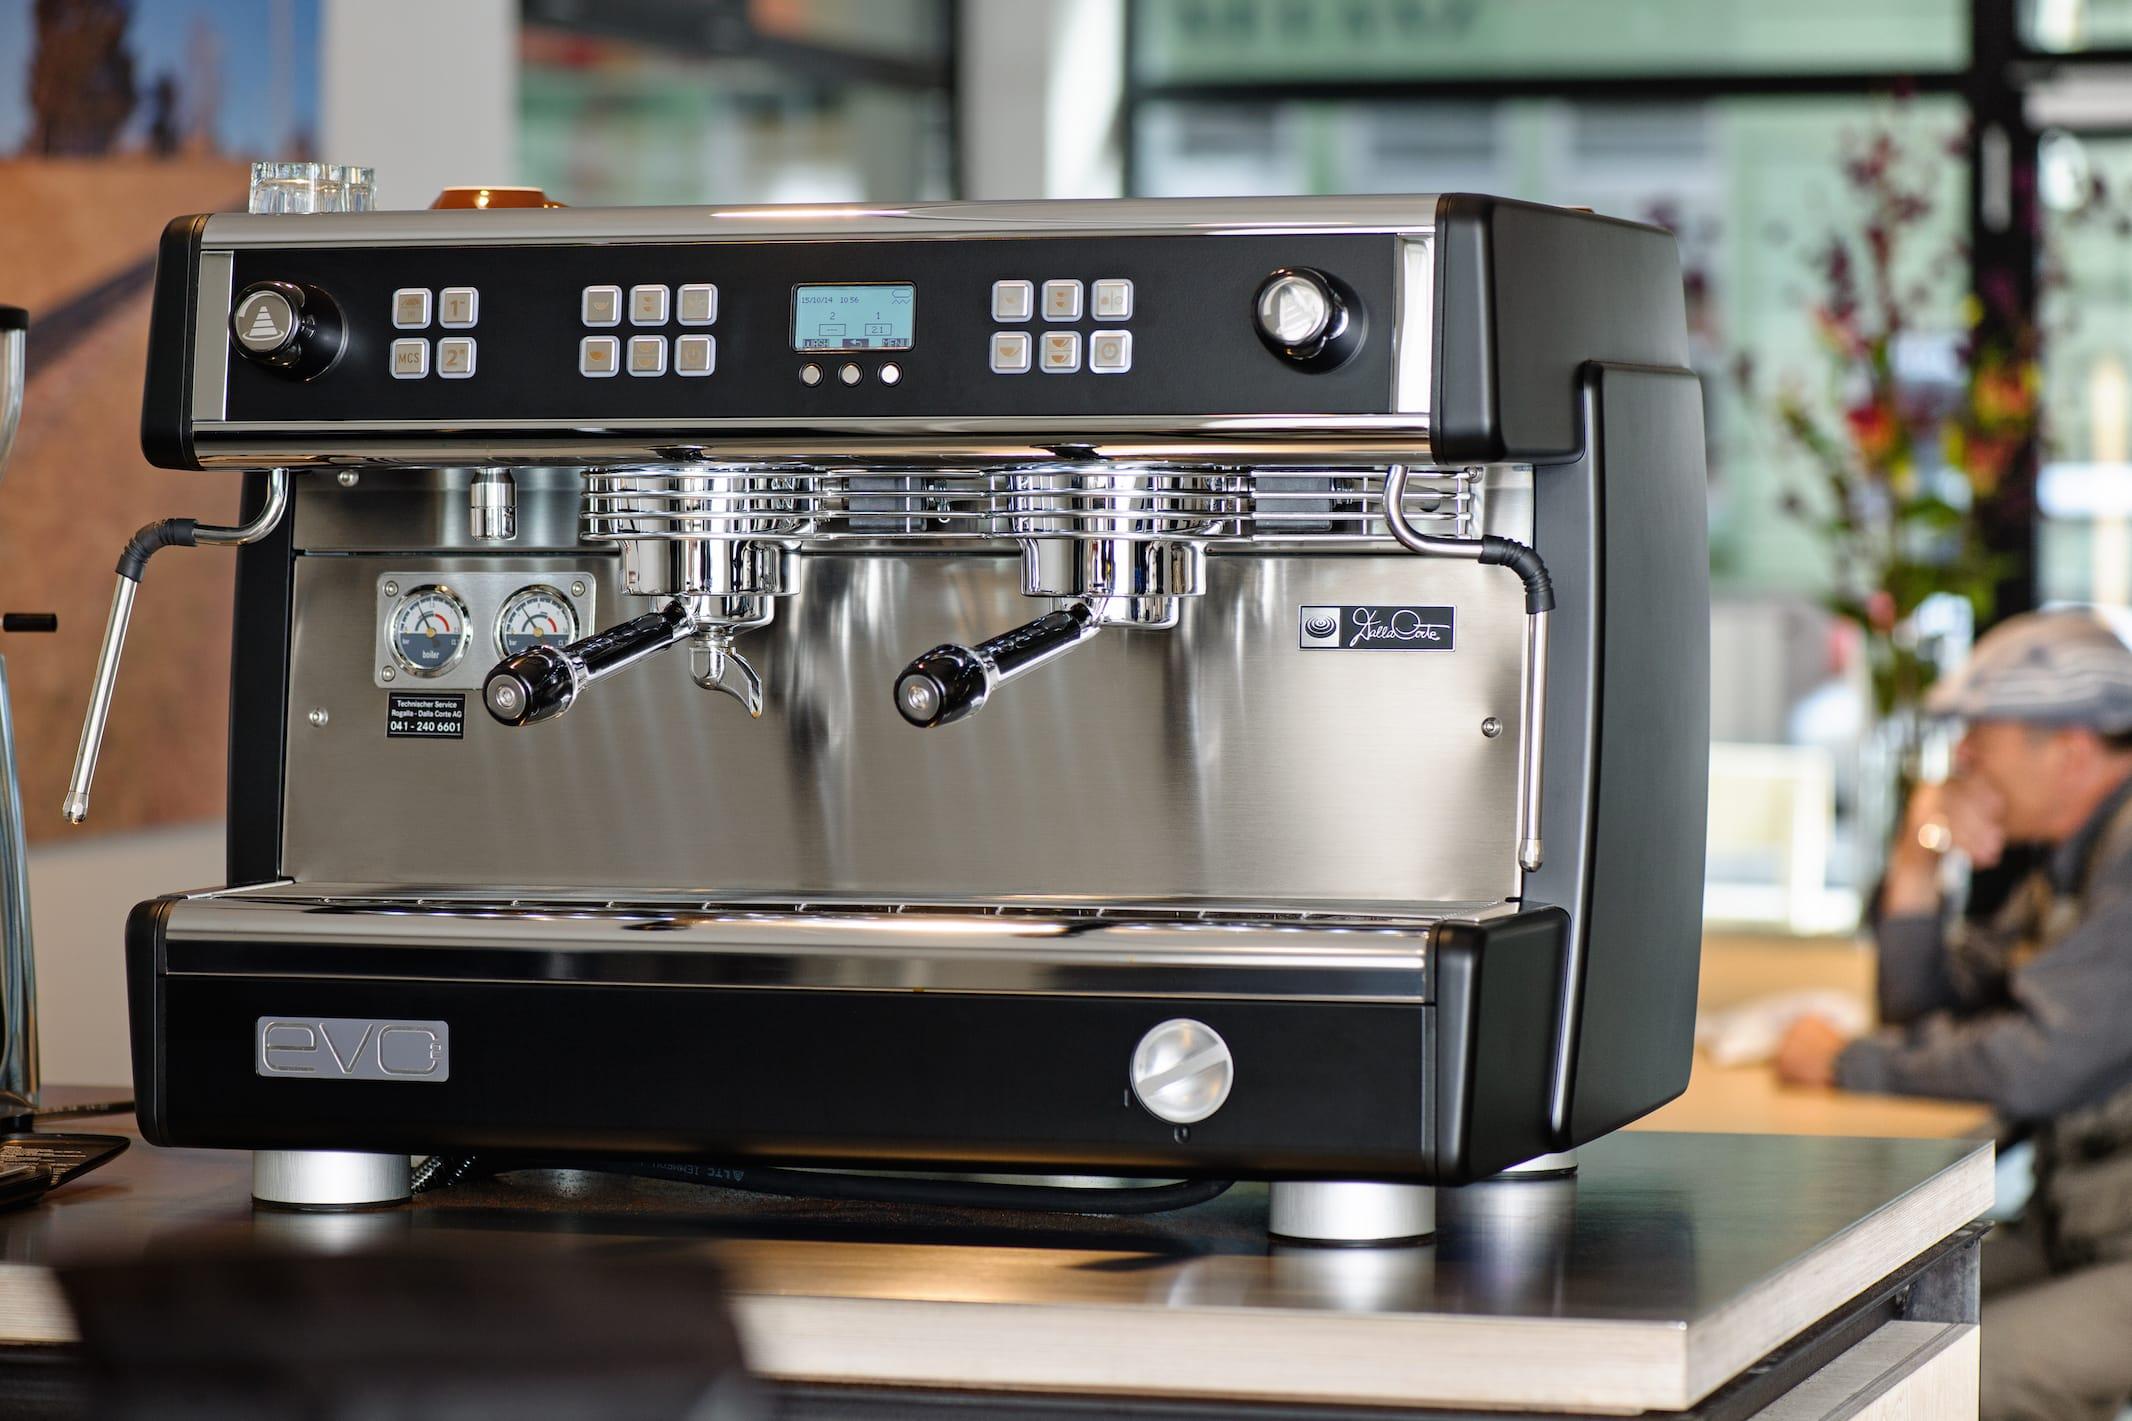 espresso-blogpost-oct-2014-vico20141015_0075_RGB-2132px